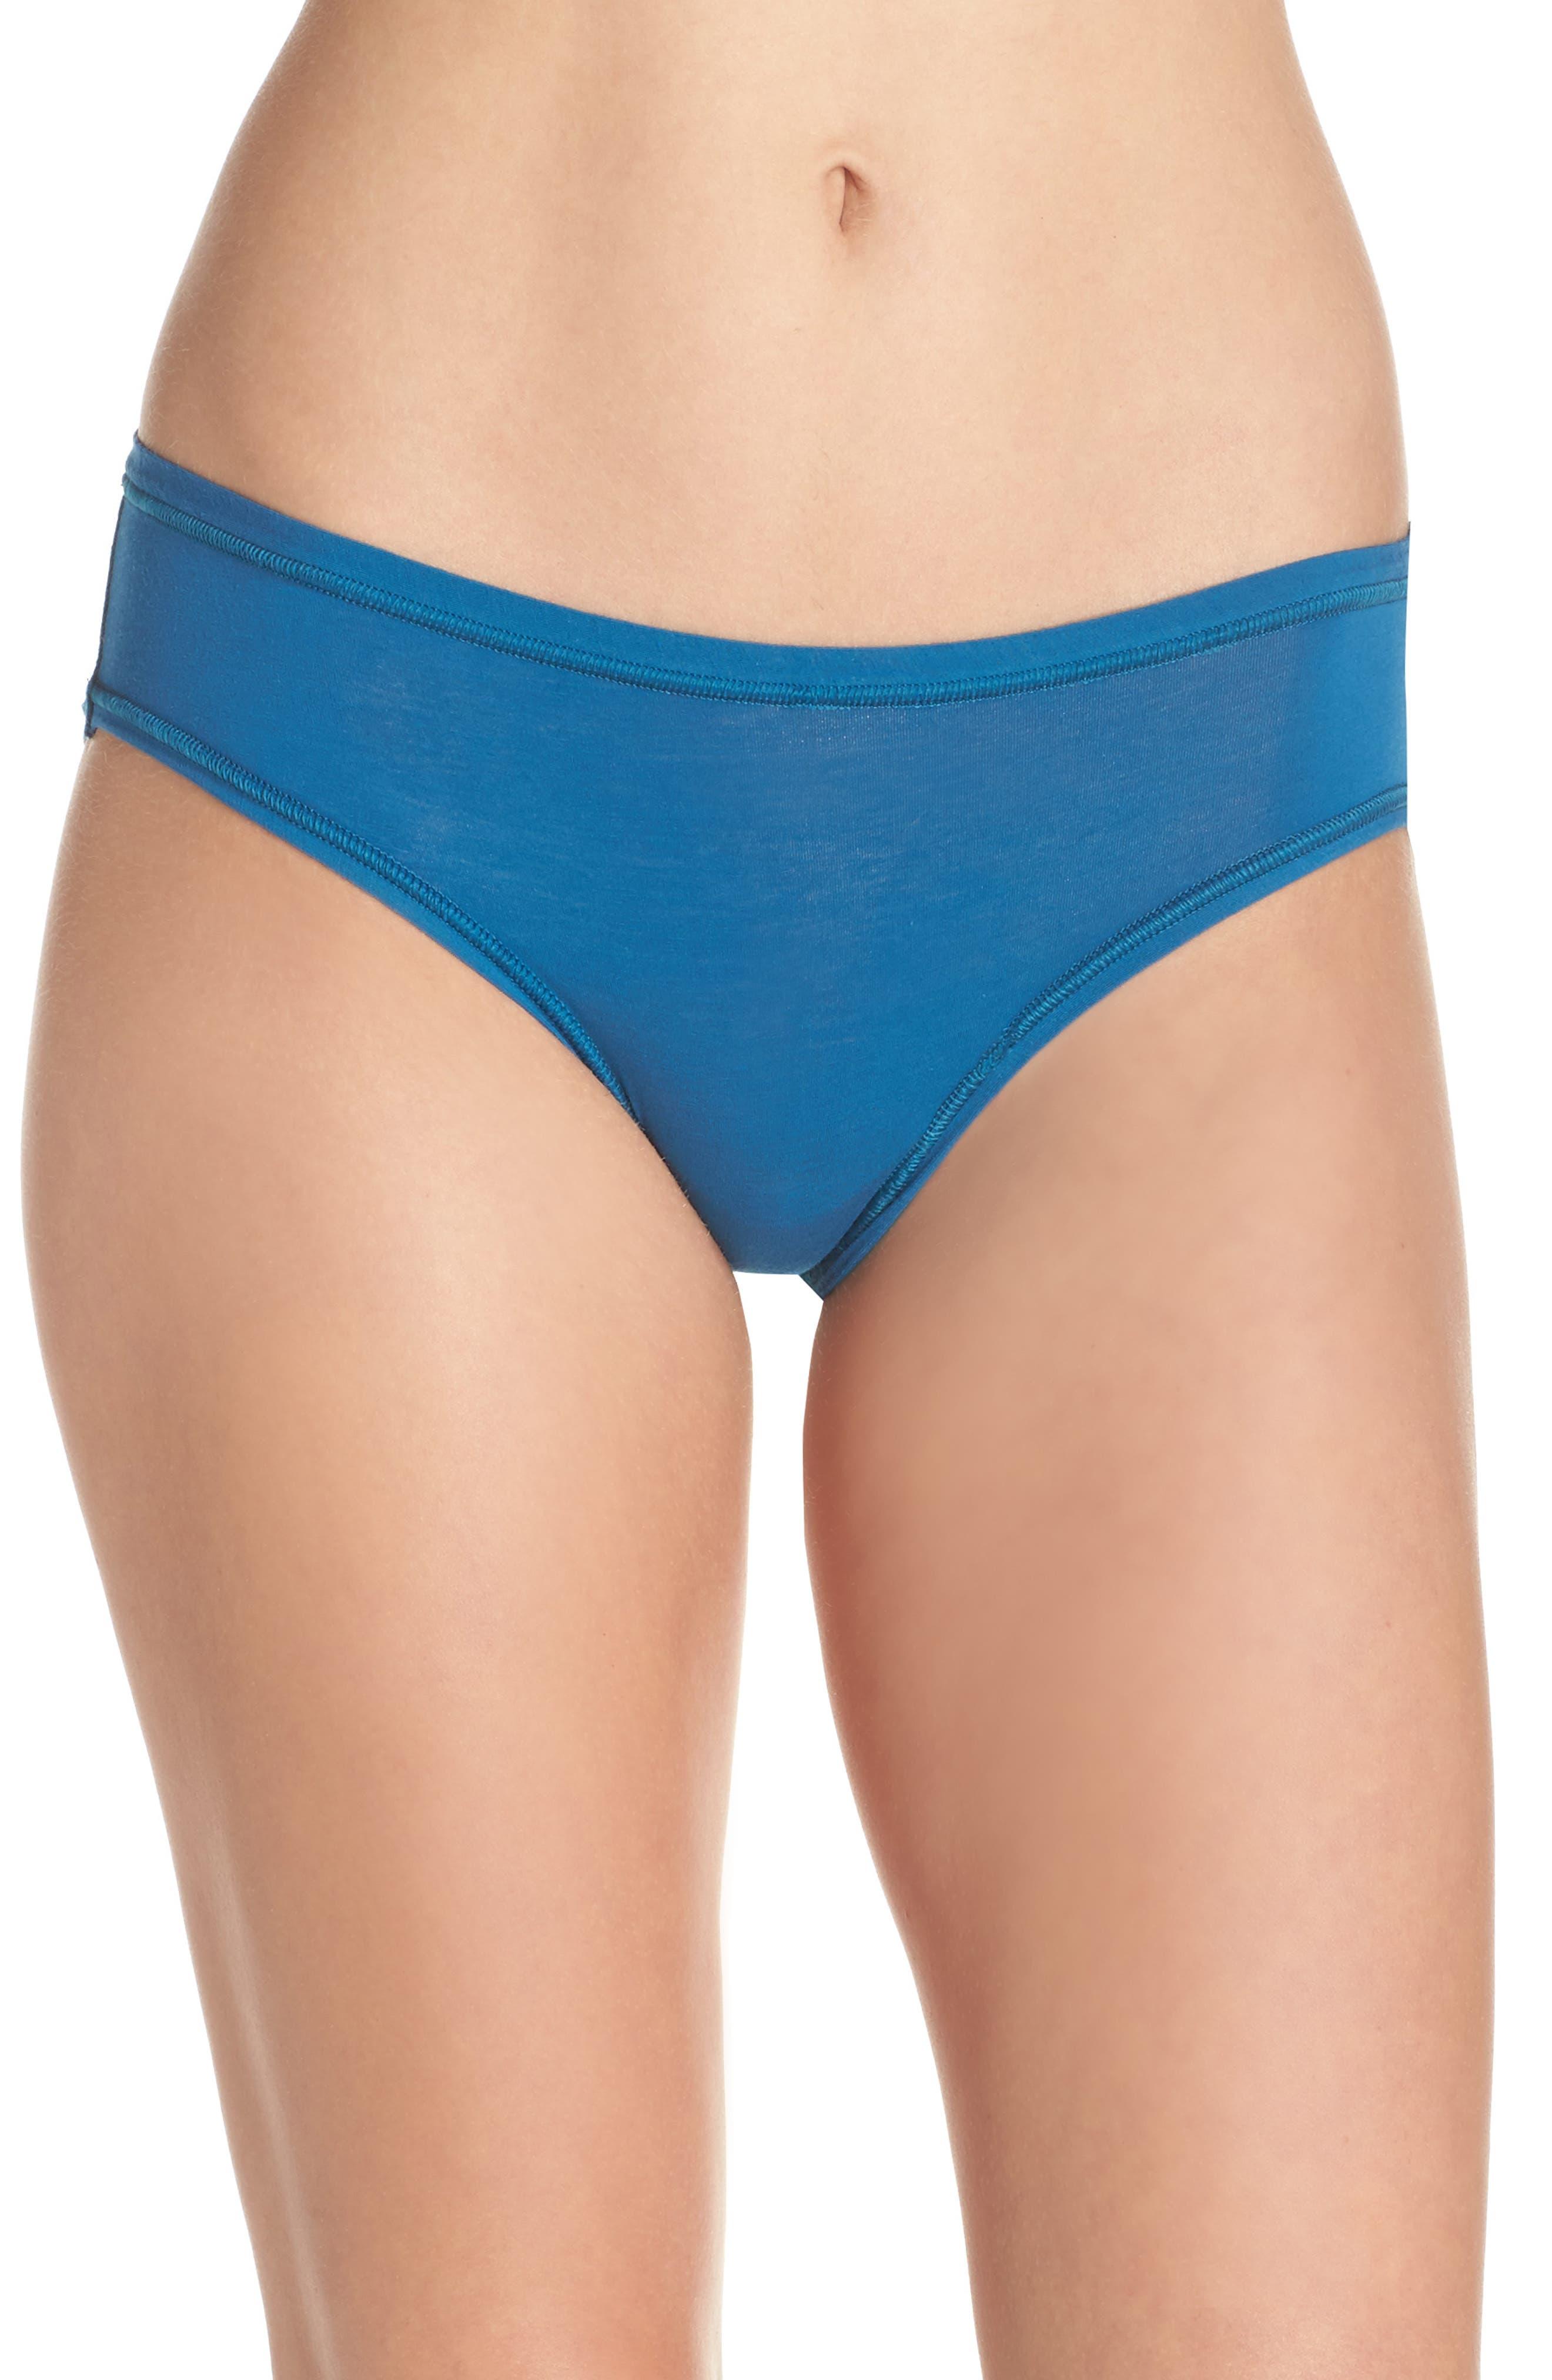 Alternate Image 1 Selected - Wacoal B Fitting Bikini (3 for $39)